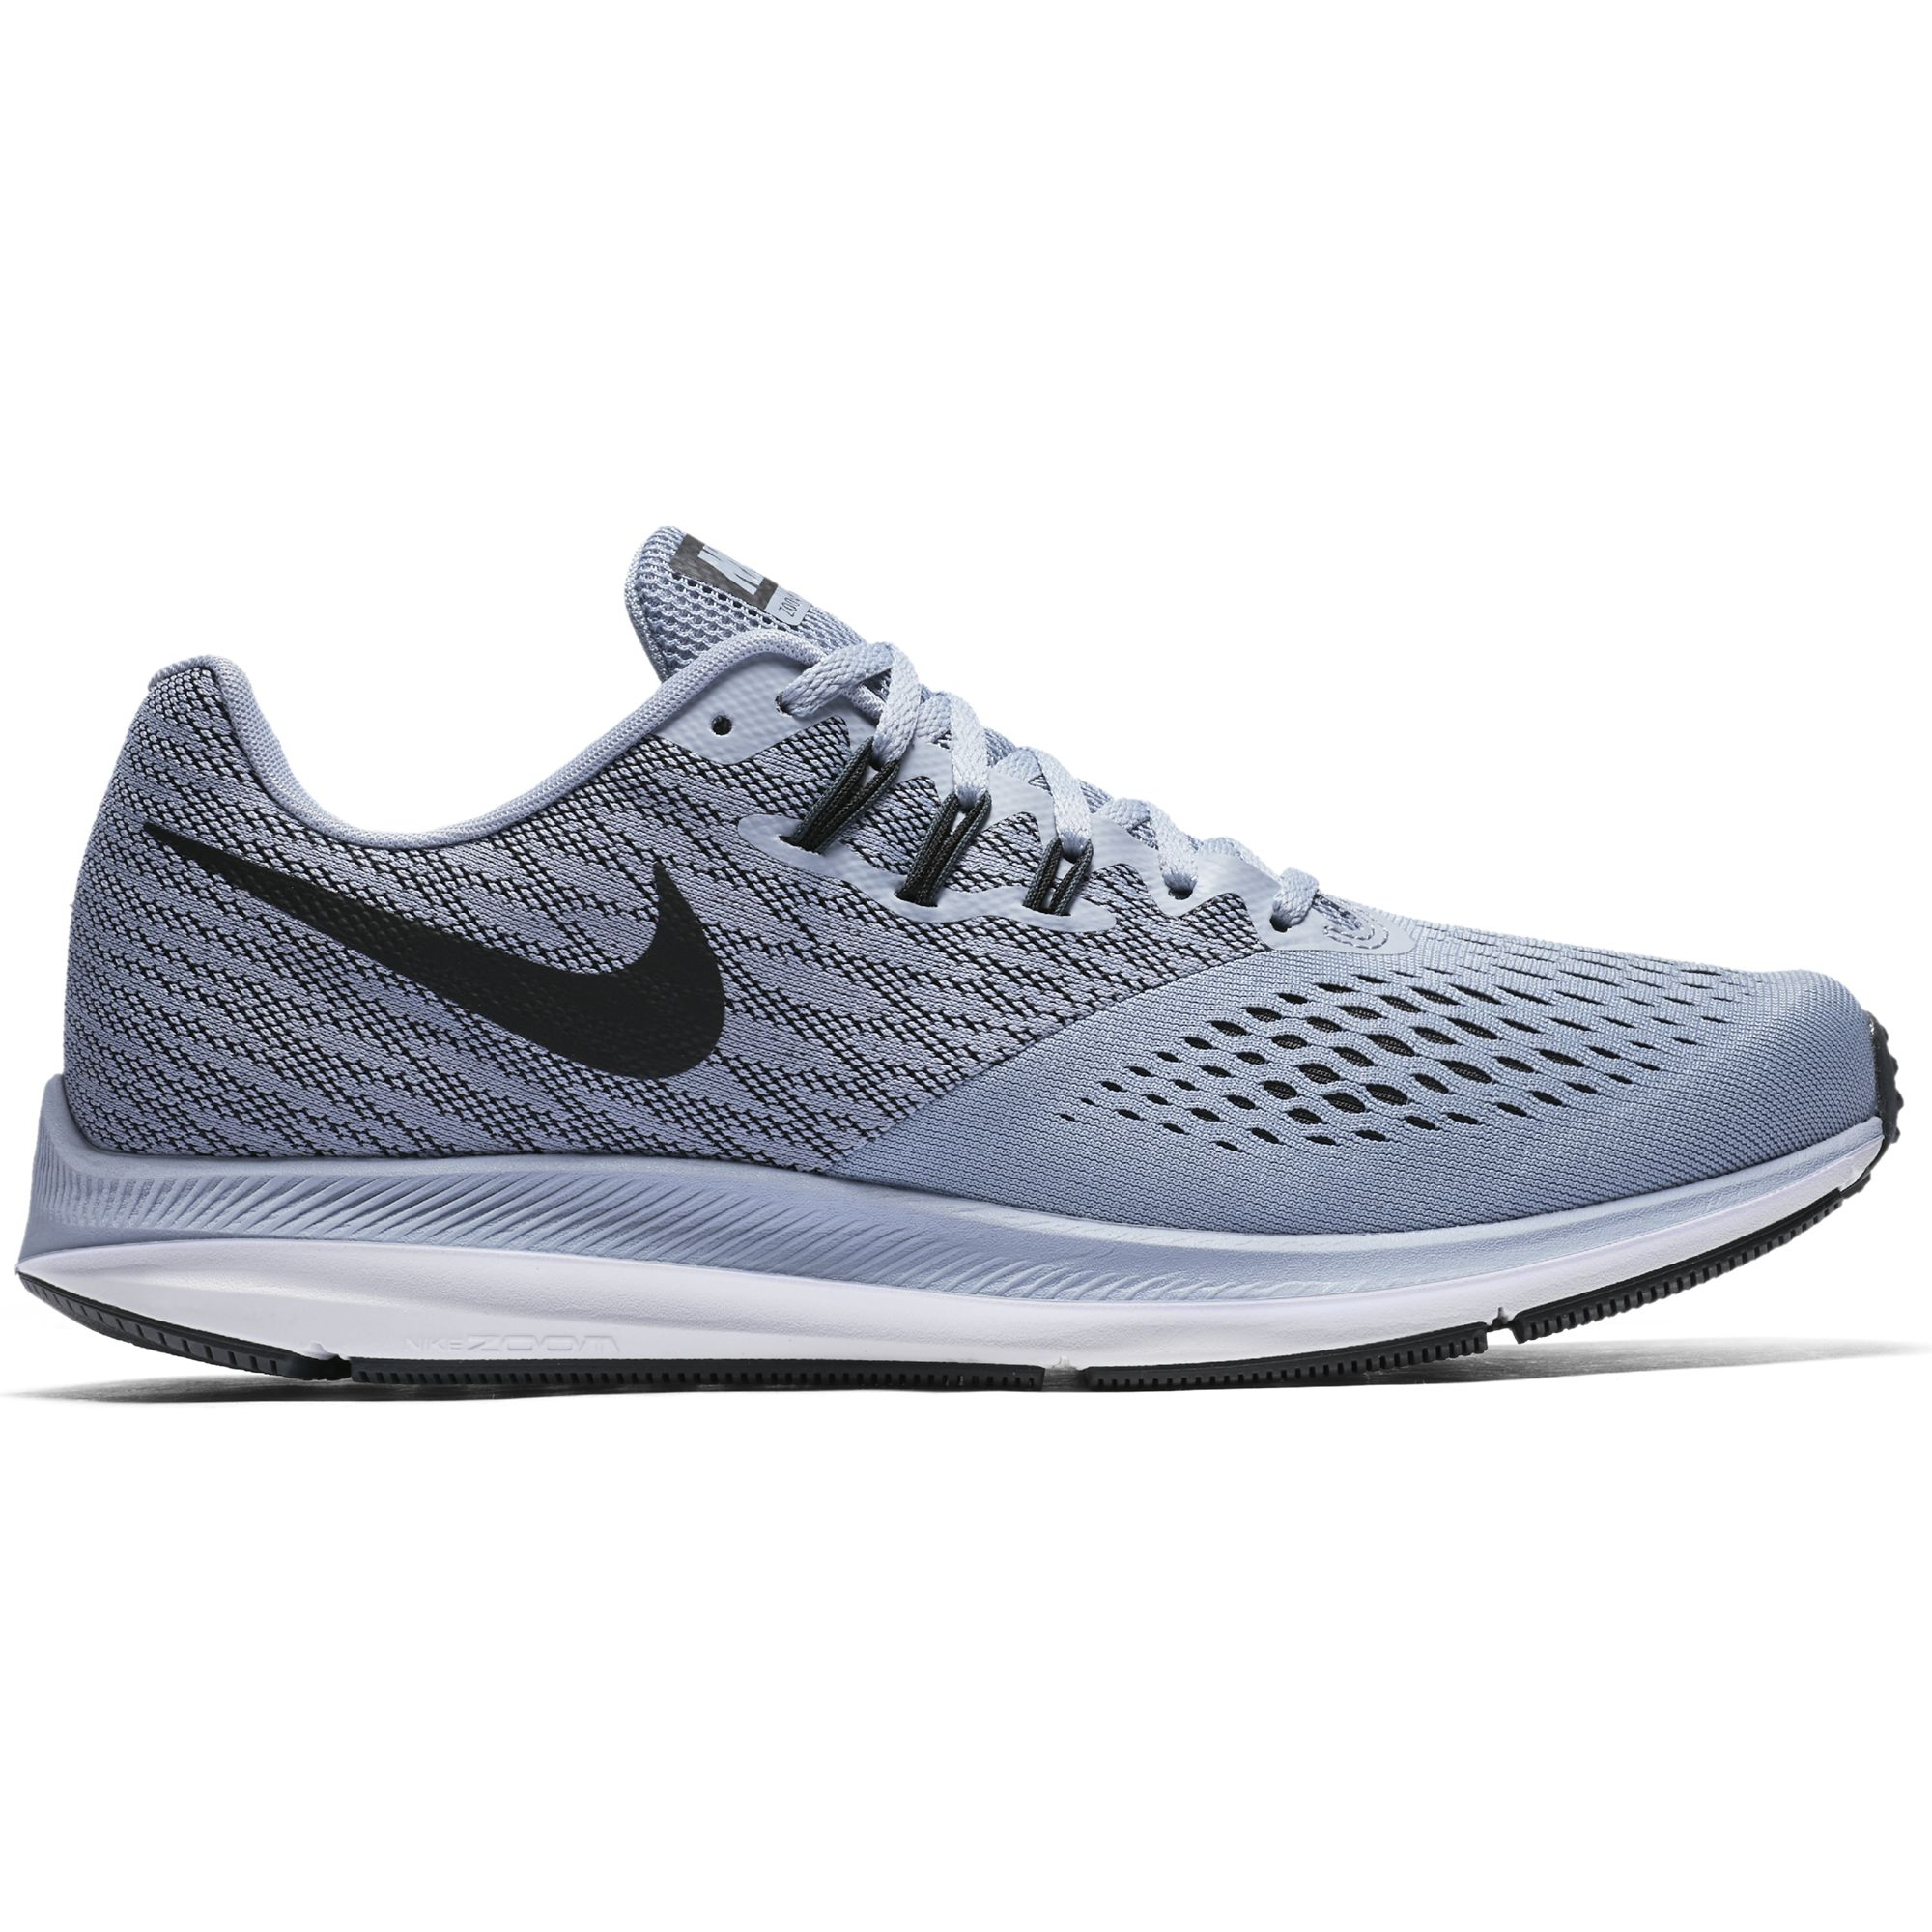 Nike Men's Air Zoom Winflo 4 Running Shoe Glacier Grey/ Black Size 11.5